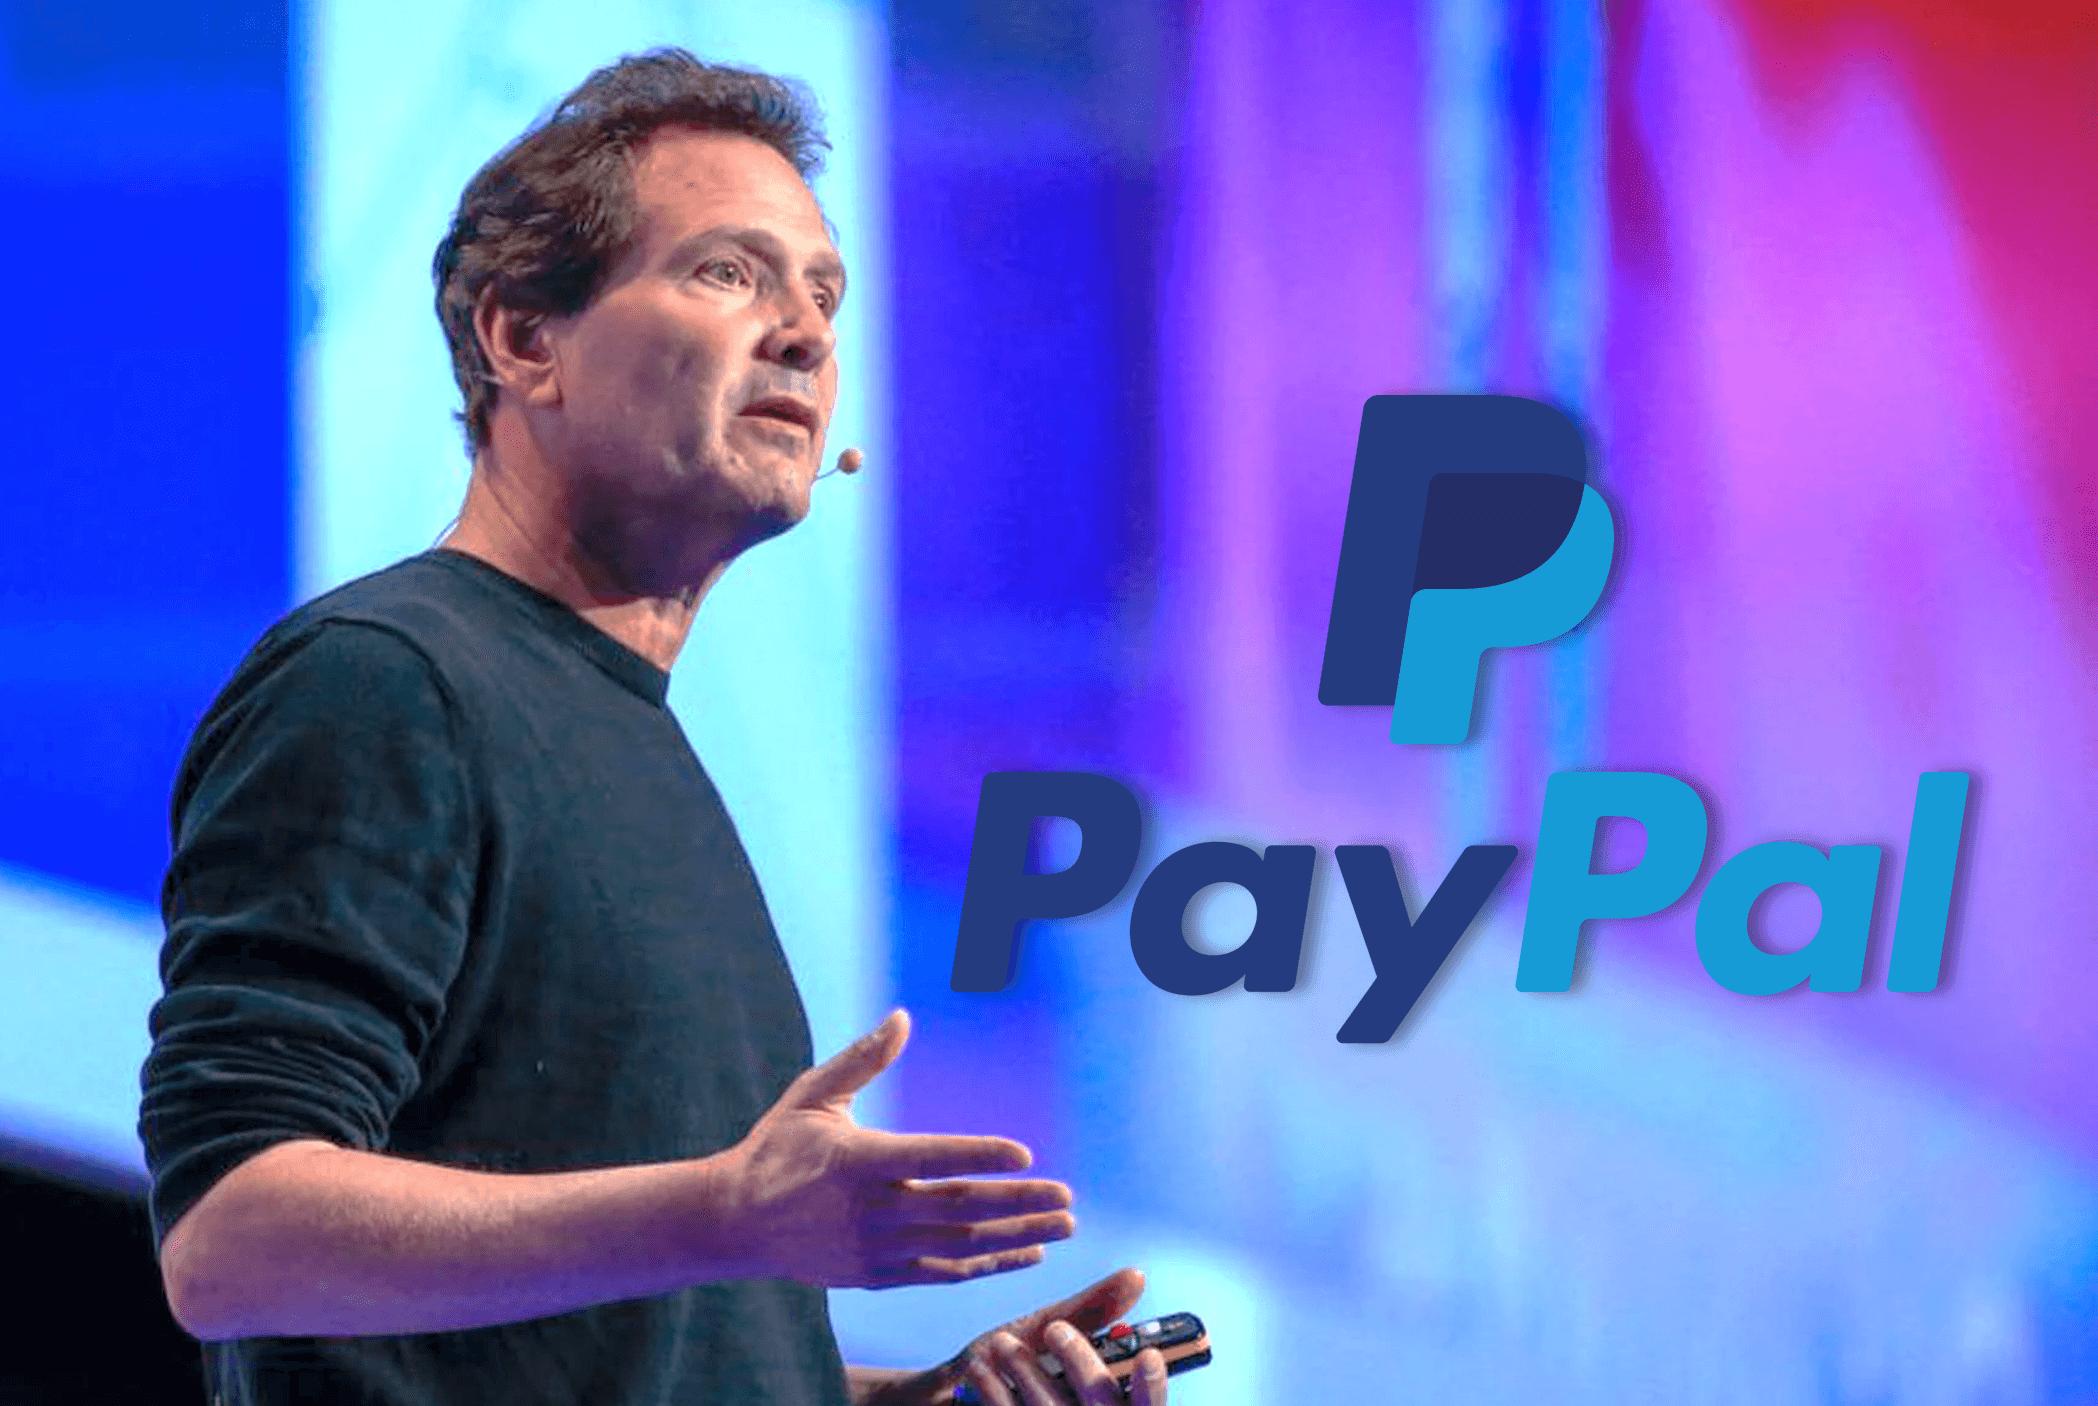 PayPal的加密貨幣「超級APP錢包」即將問世!將有高收益儲蓄、傳訊、AI 驅動功能